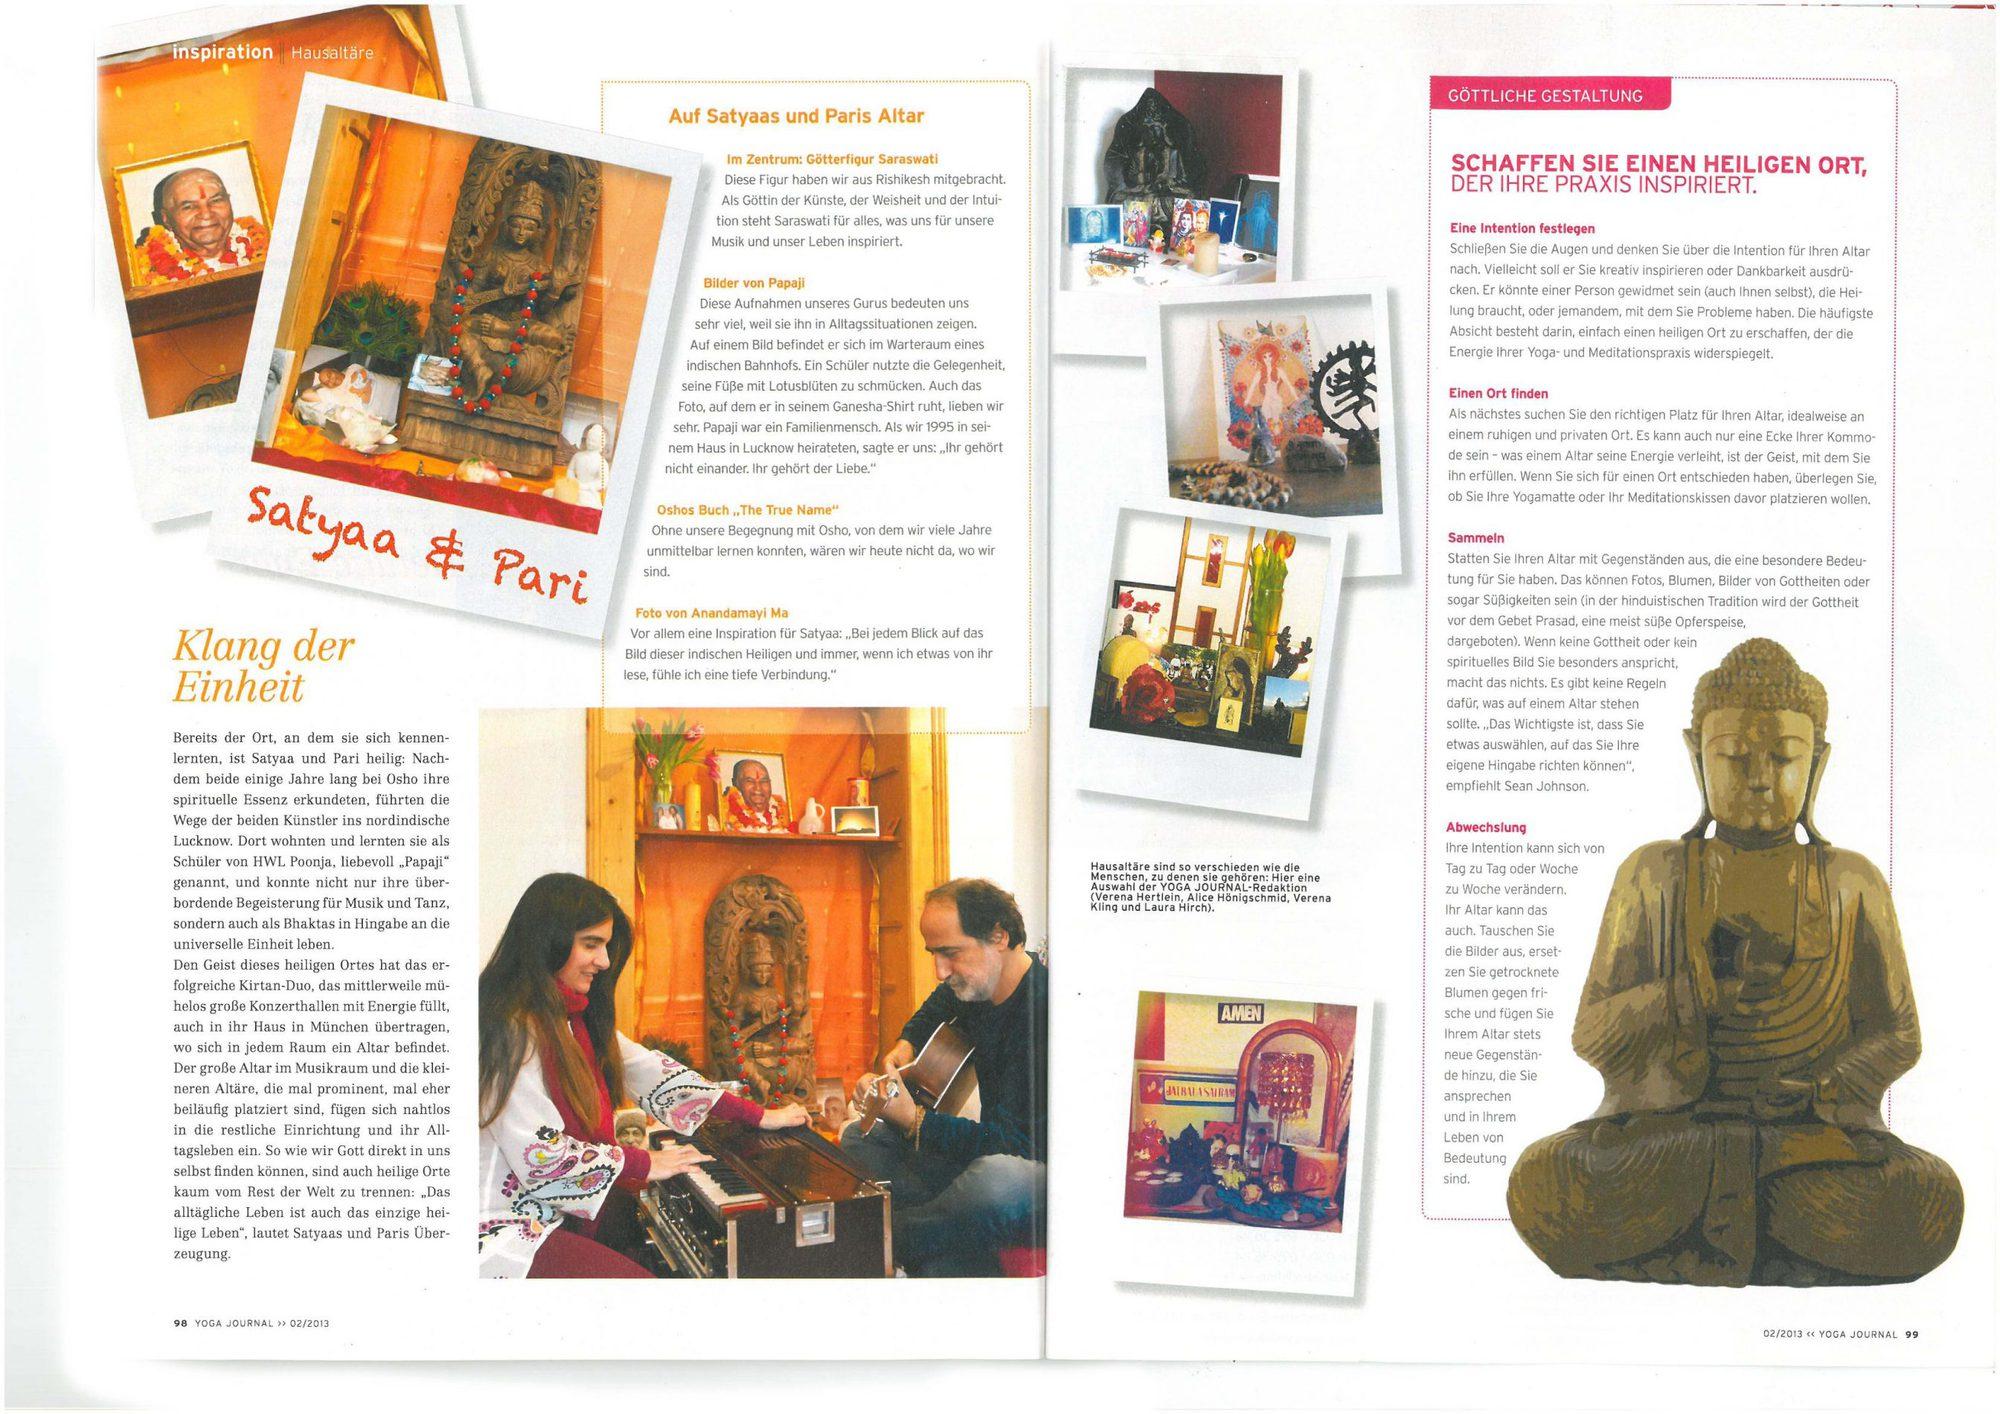 Yoga Journal Spiegel Des Herzens Satyaa Pari Retreats